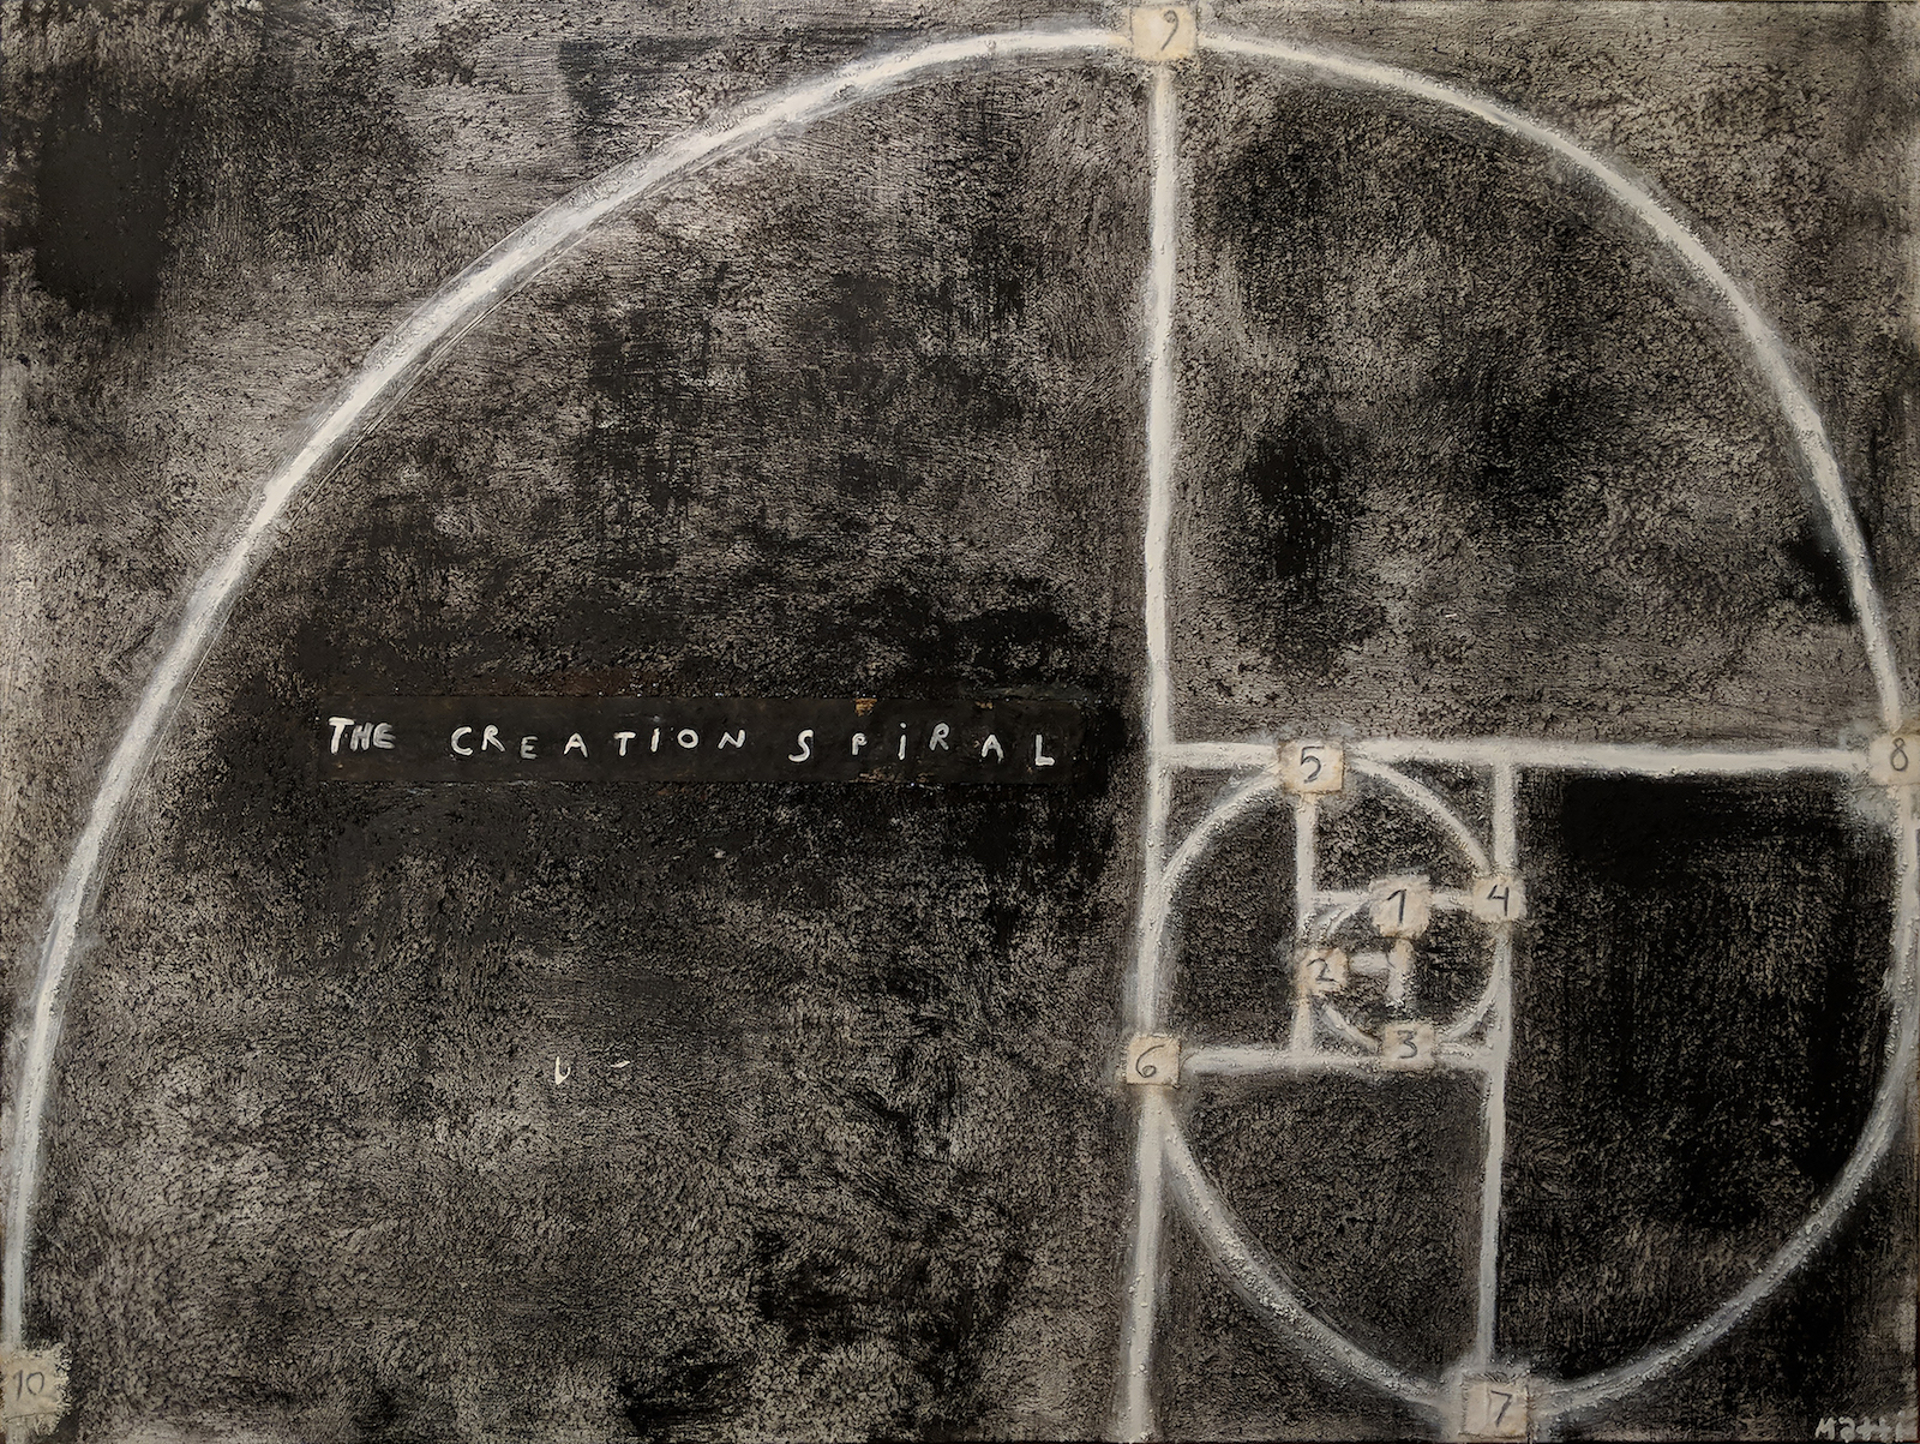 The Creation Spiral by M. Freeman